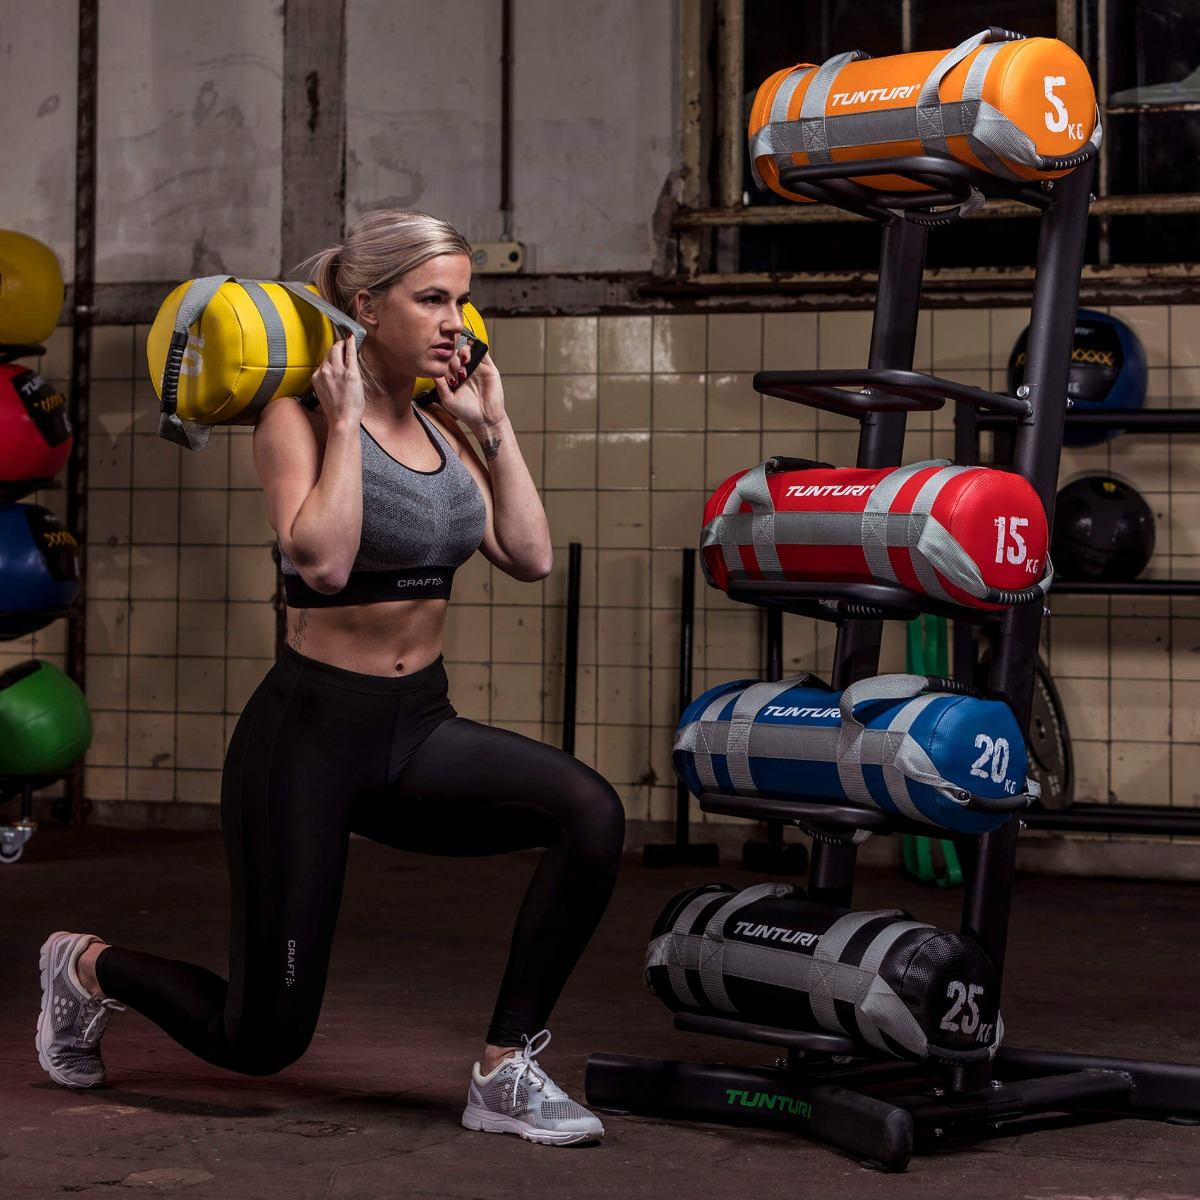 Tunturi Weightbag - Gewichtszak - Power Bag - 20 kilo-531513